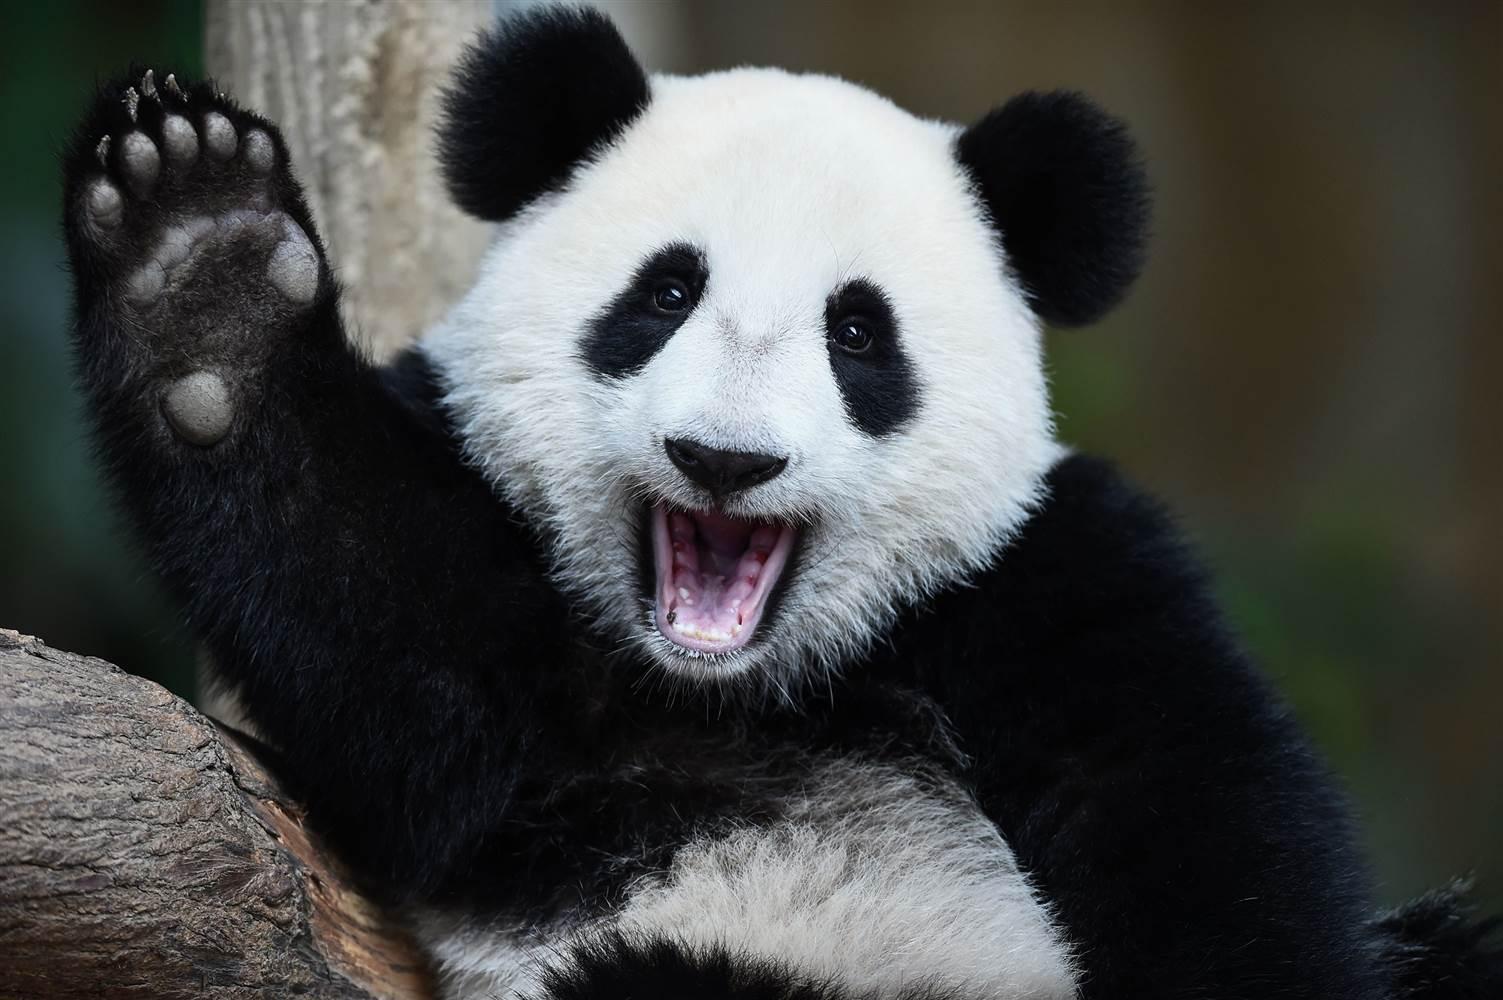 Images of Panda | 1503x1000